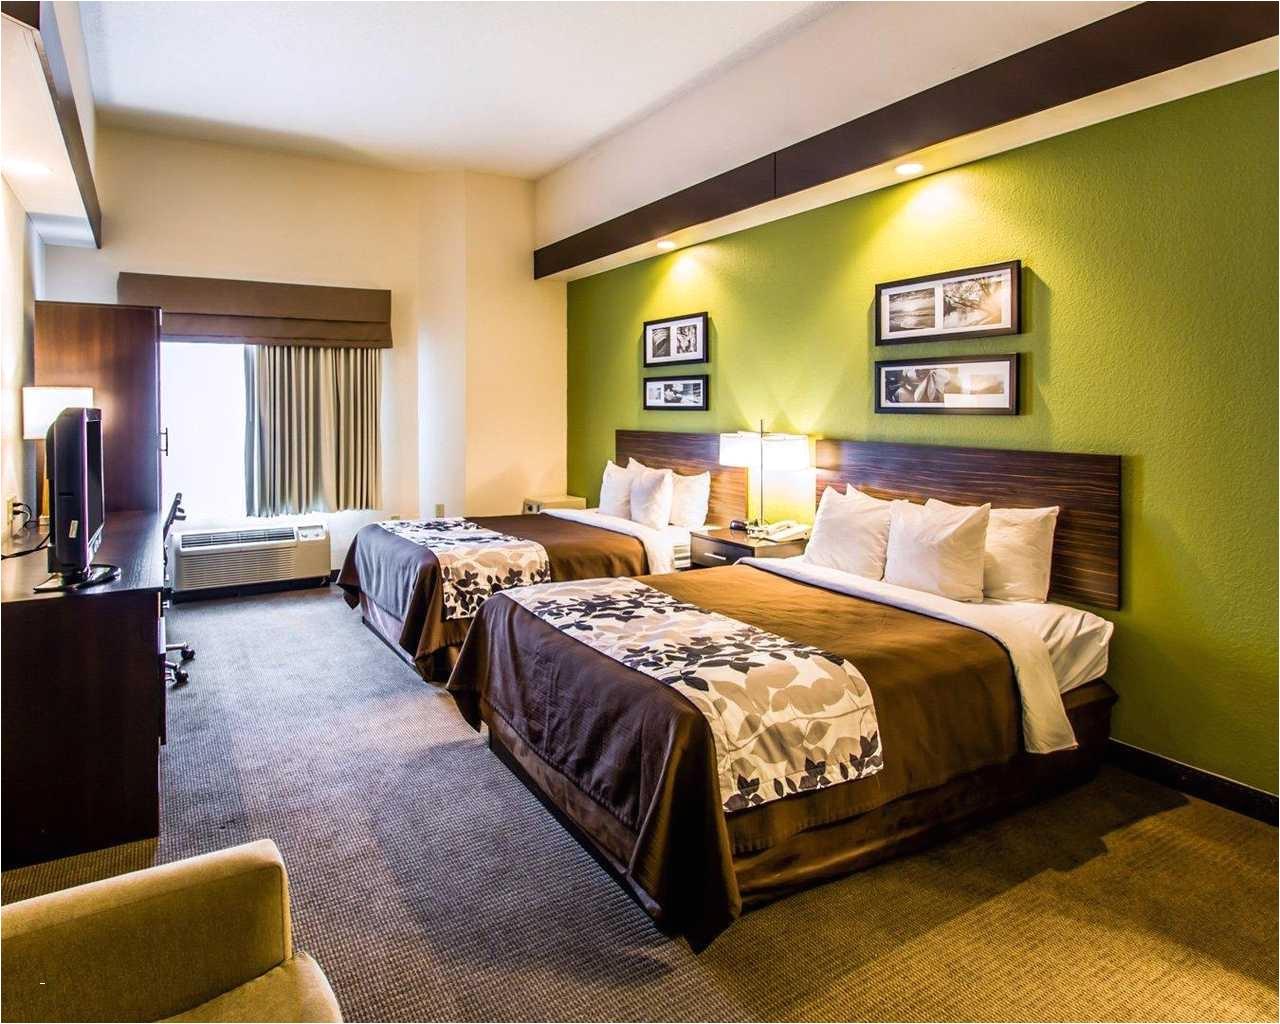 2 bedroom hotel suites international drive orlando for Orlando 2 bedroom suite hotels